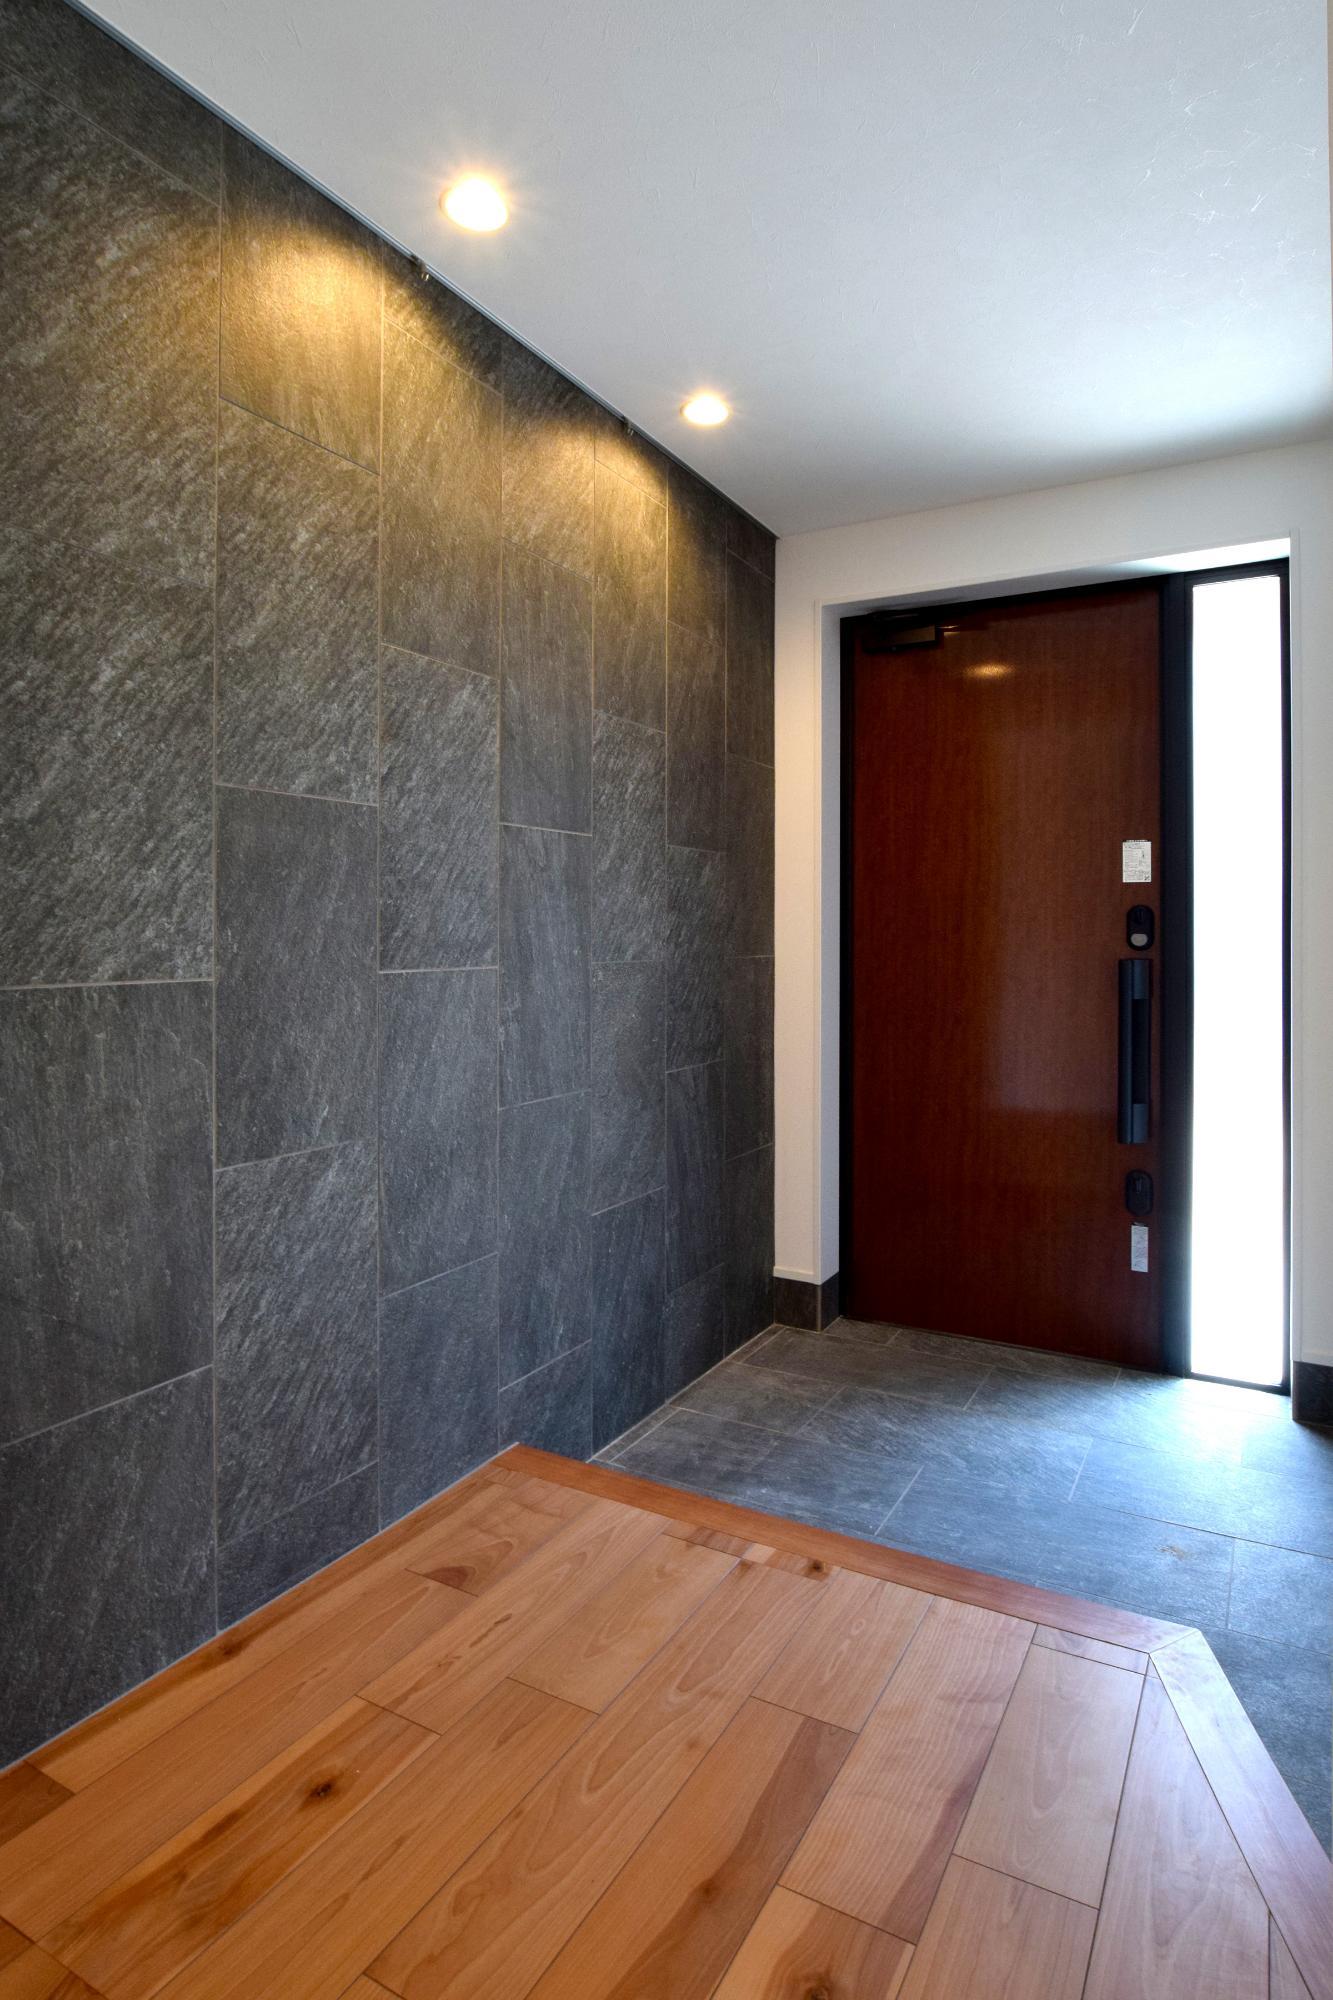 DETAIL HOME(ディテールホーム)「断熱材が2倍の全館空調の家」のシンプル・ナチュラル・モダンな玄関の実例写真